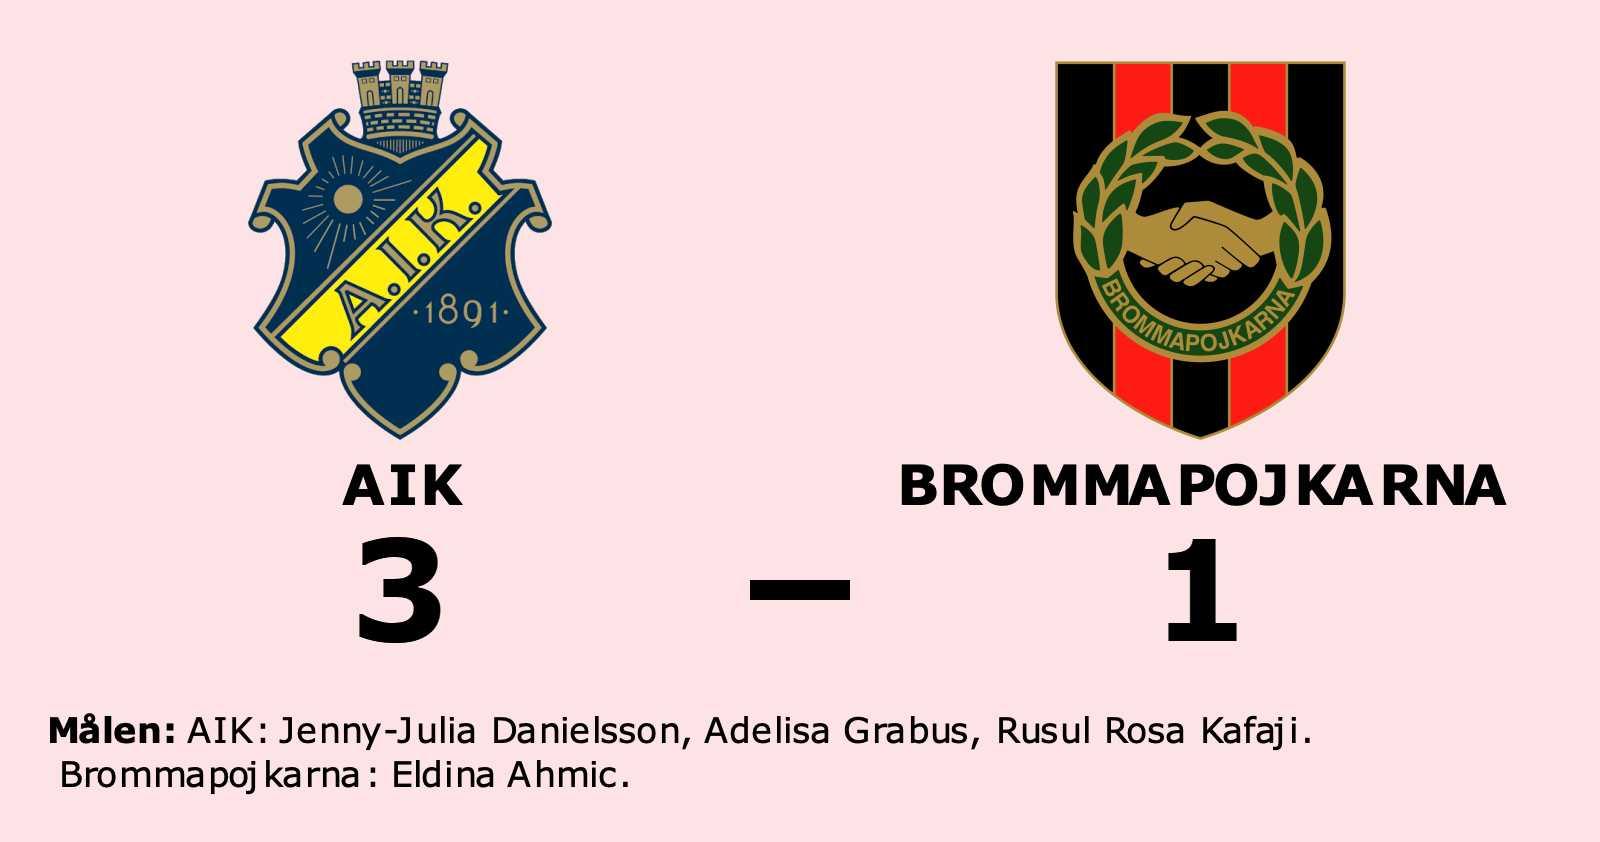 Brommapojkarna kunde inte stoppa AIK:s segertåg